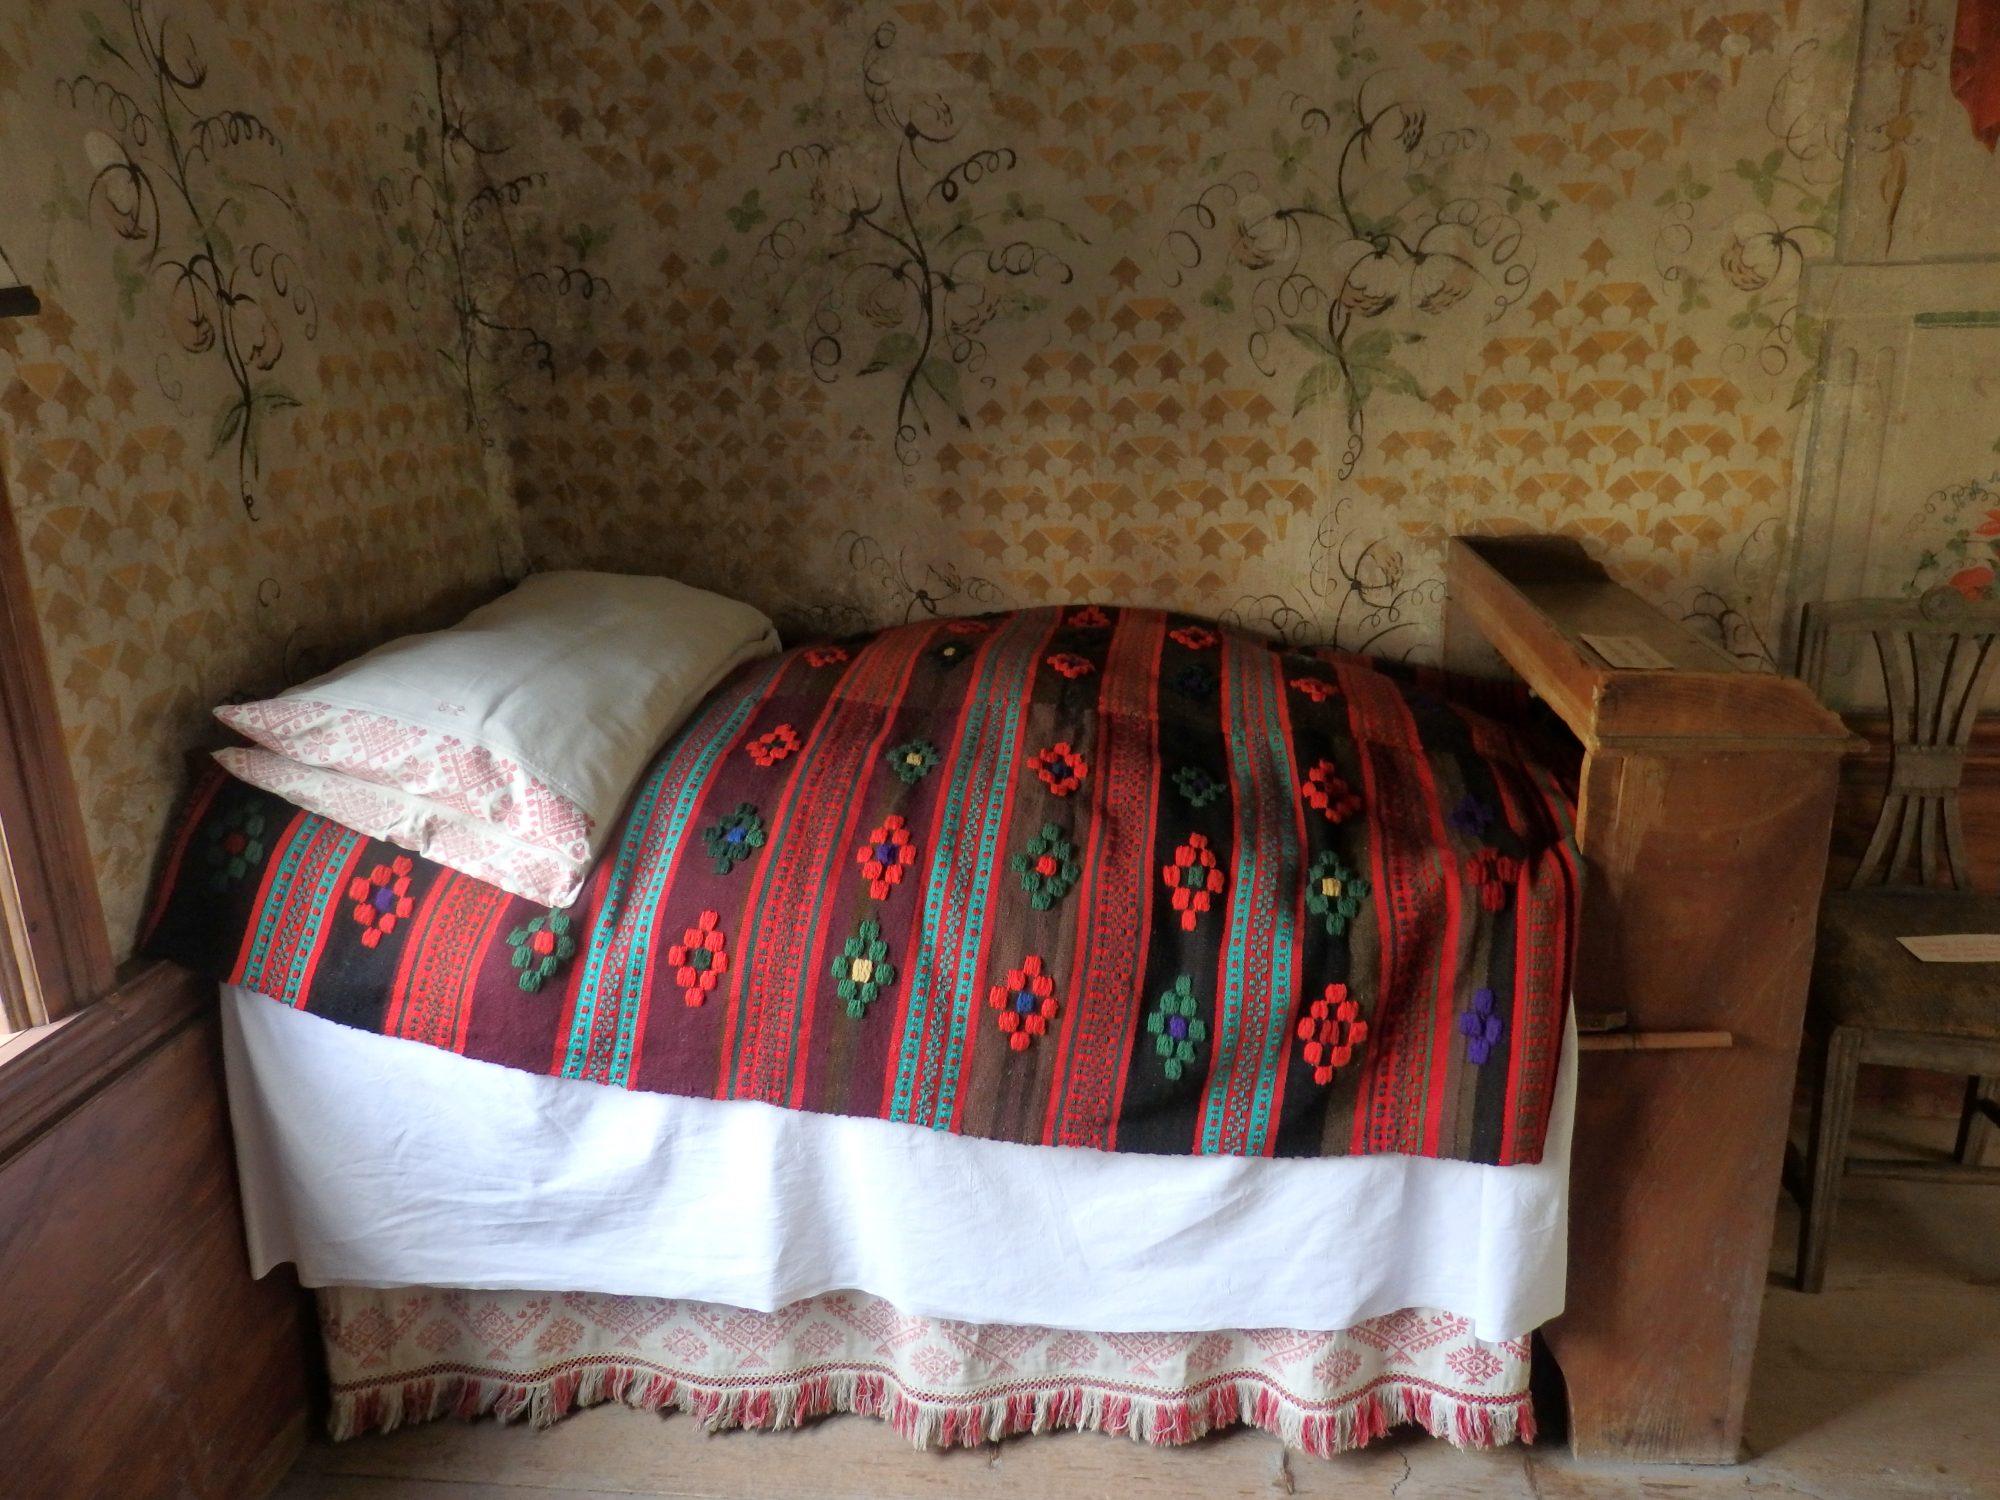 an 1850 farmhouse bedroom at Skansen, Stockholm, Sweden